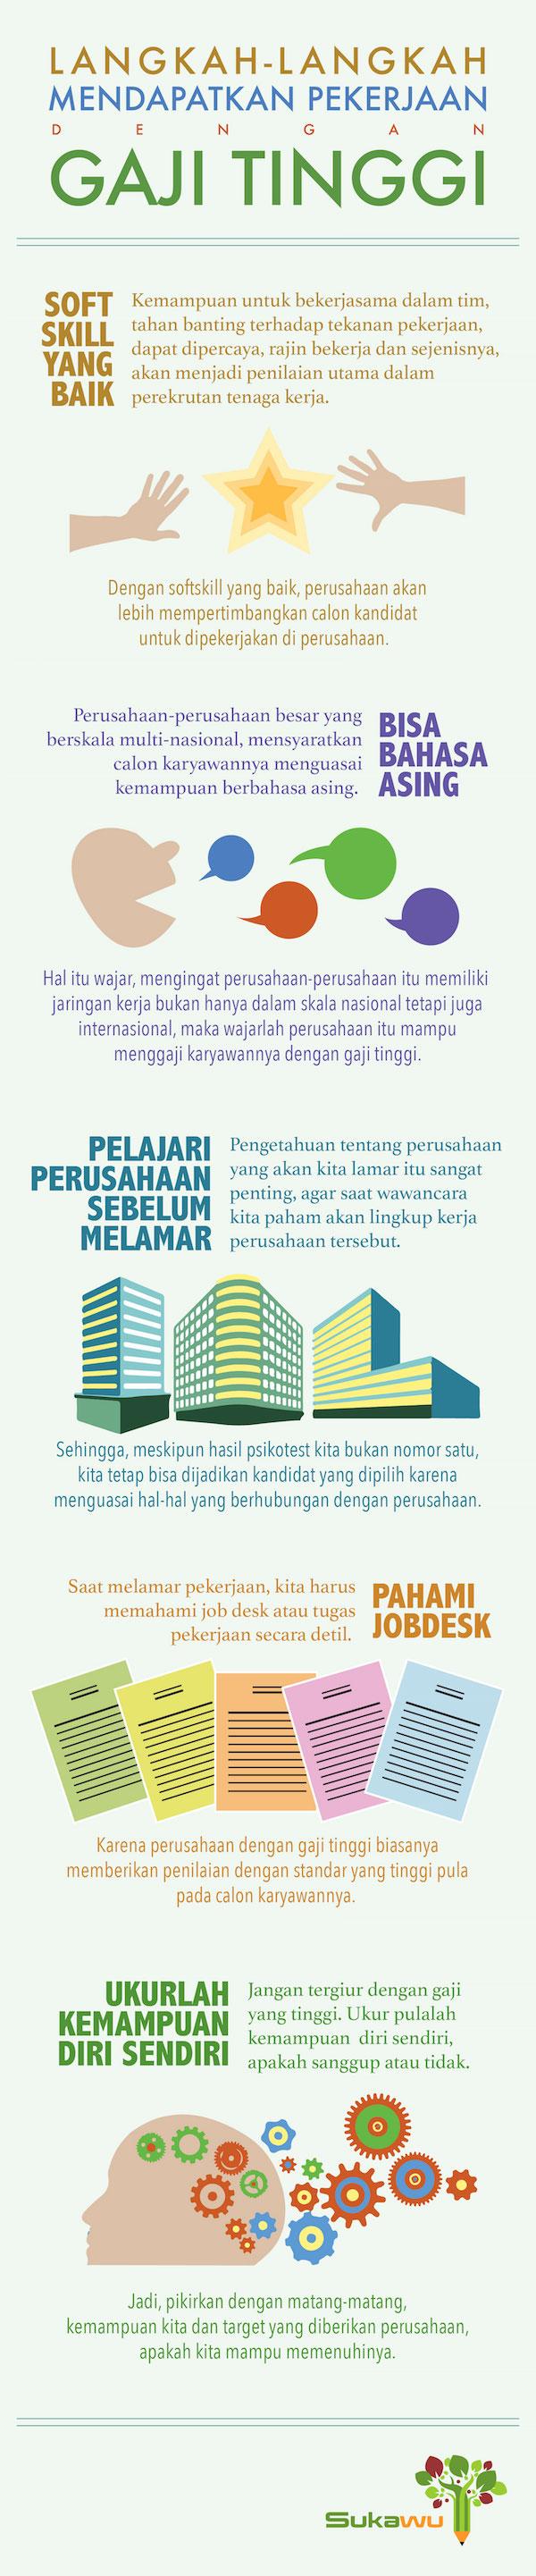 Infografik untuk cara-cara mendapatkan pekerjaan dengan gaji tinggi